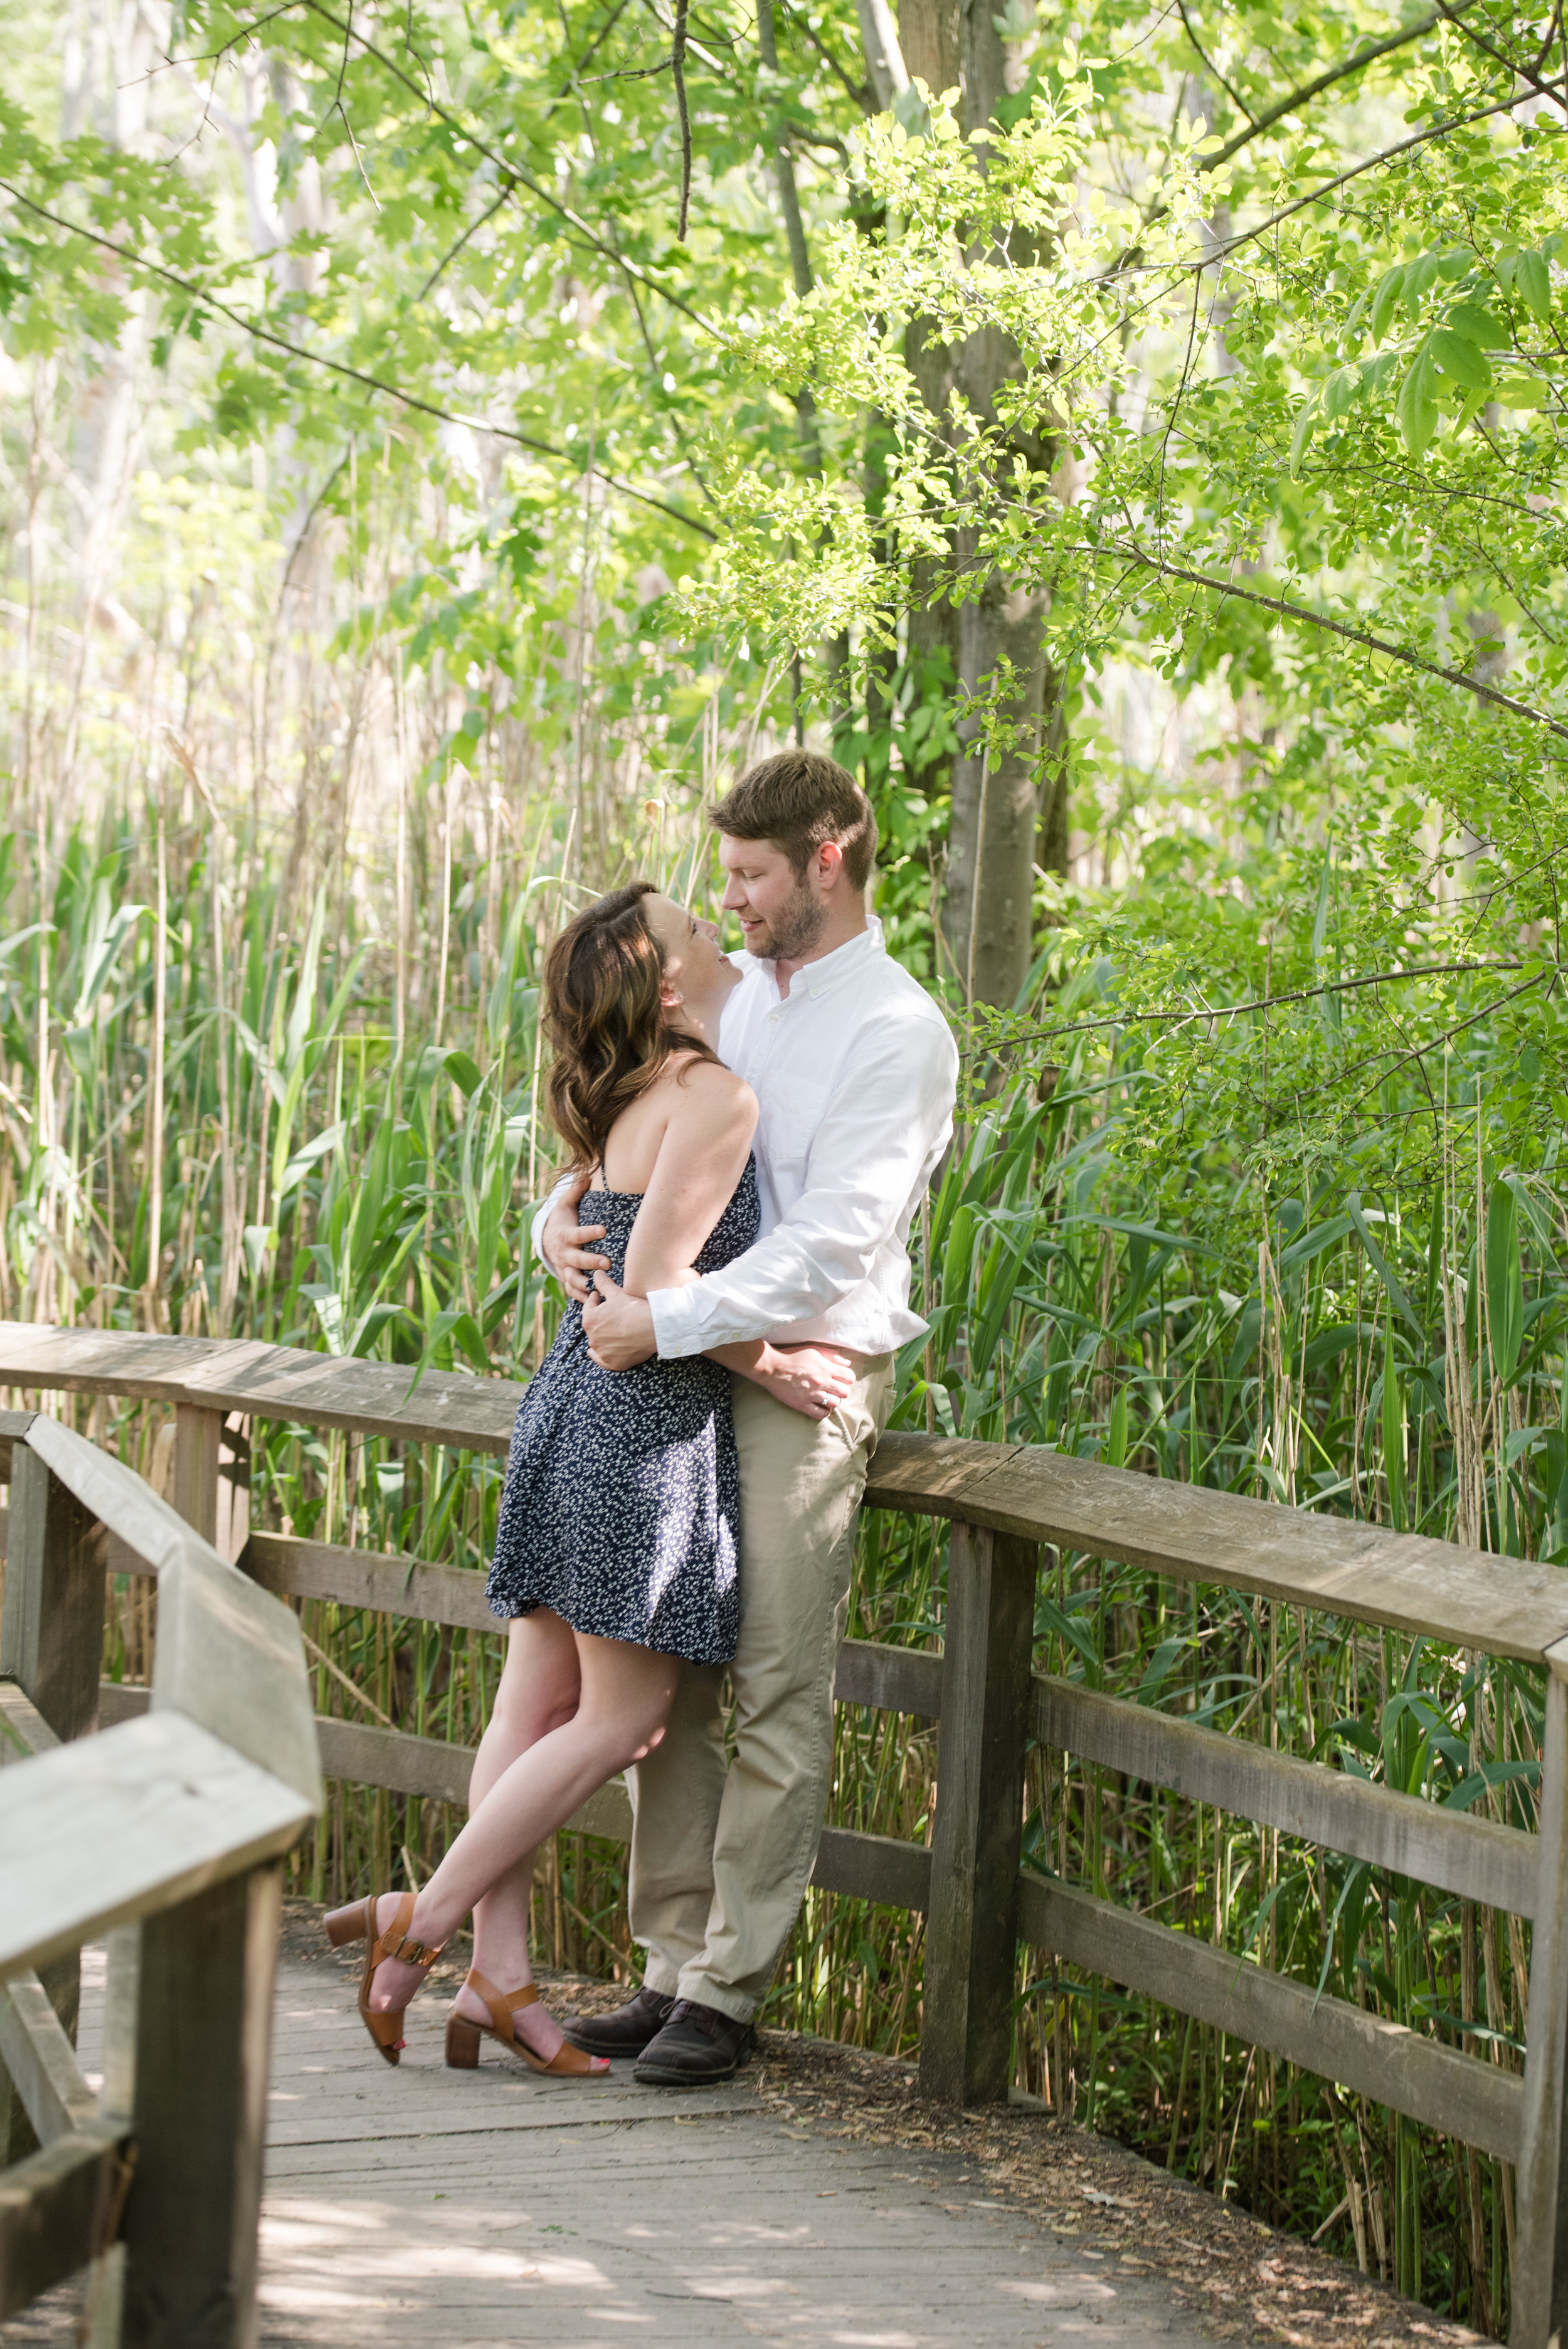 GALLERY-2019-6-9 Kaitlin, Justin & Liam Engagement 0795 117.jpg